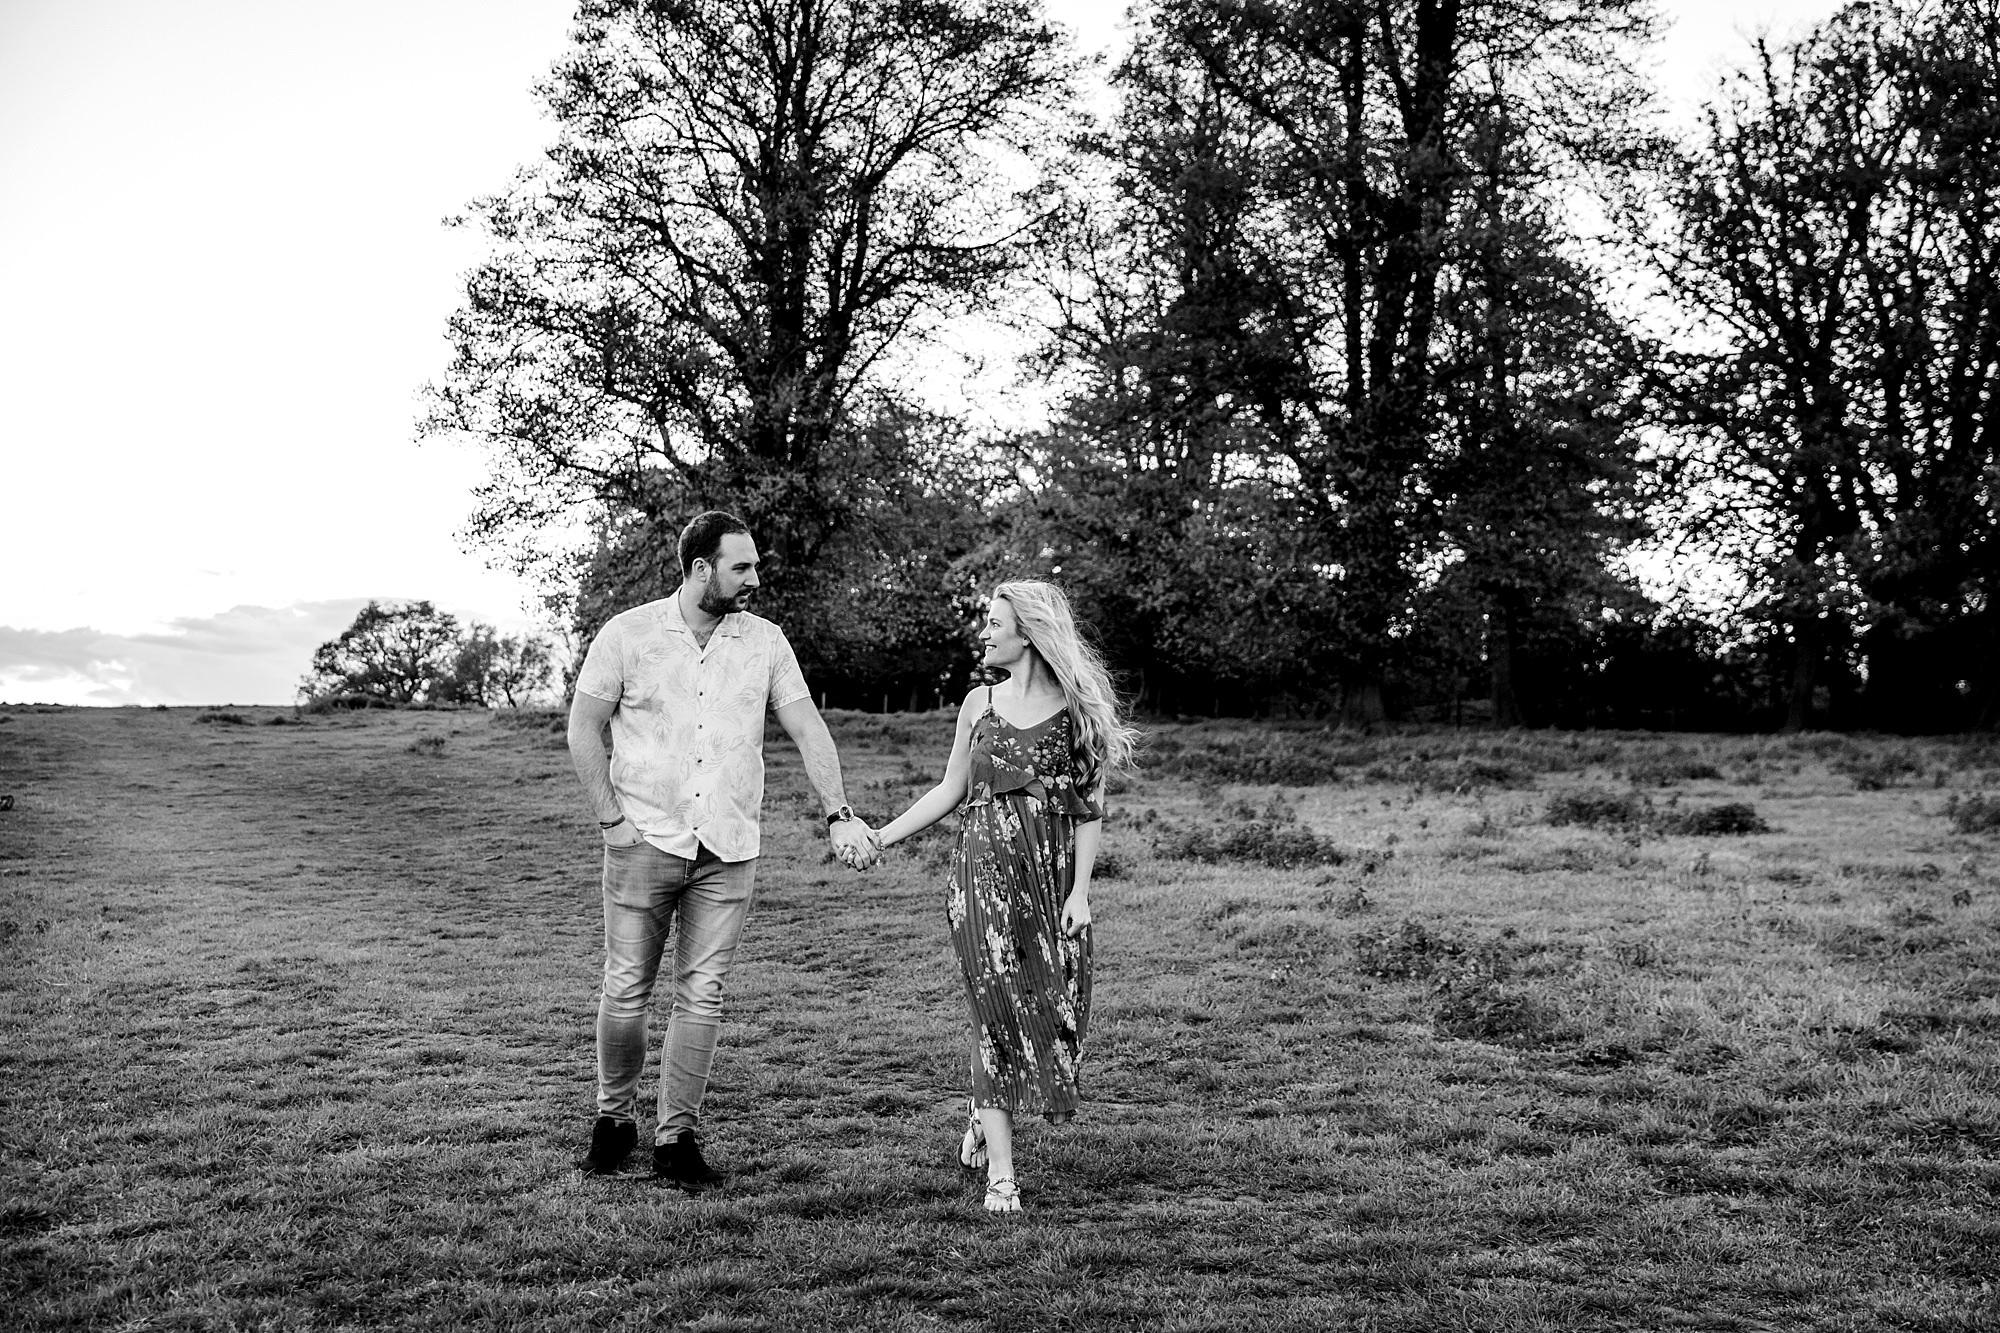 Summer evening engagement shoot couple walk together through park